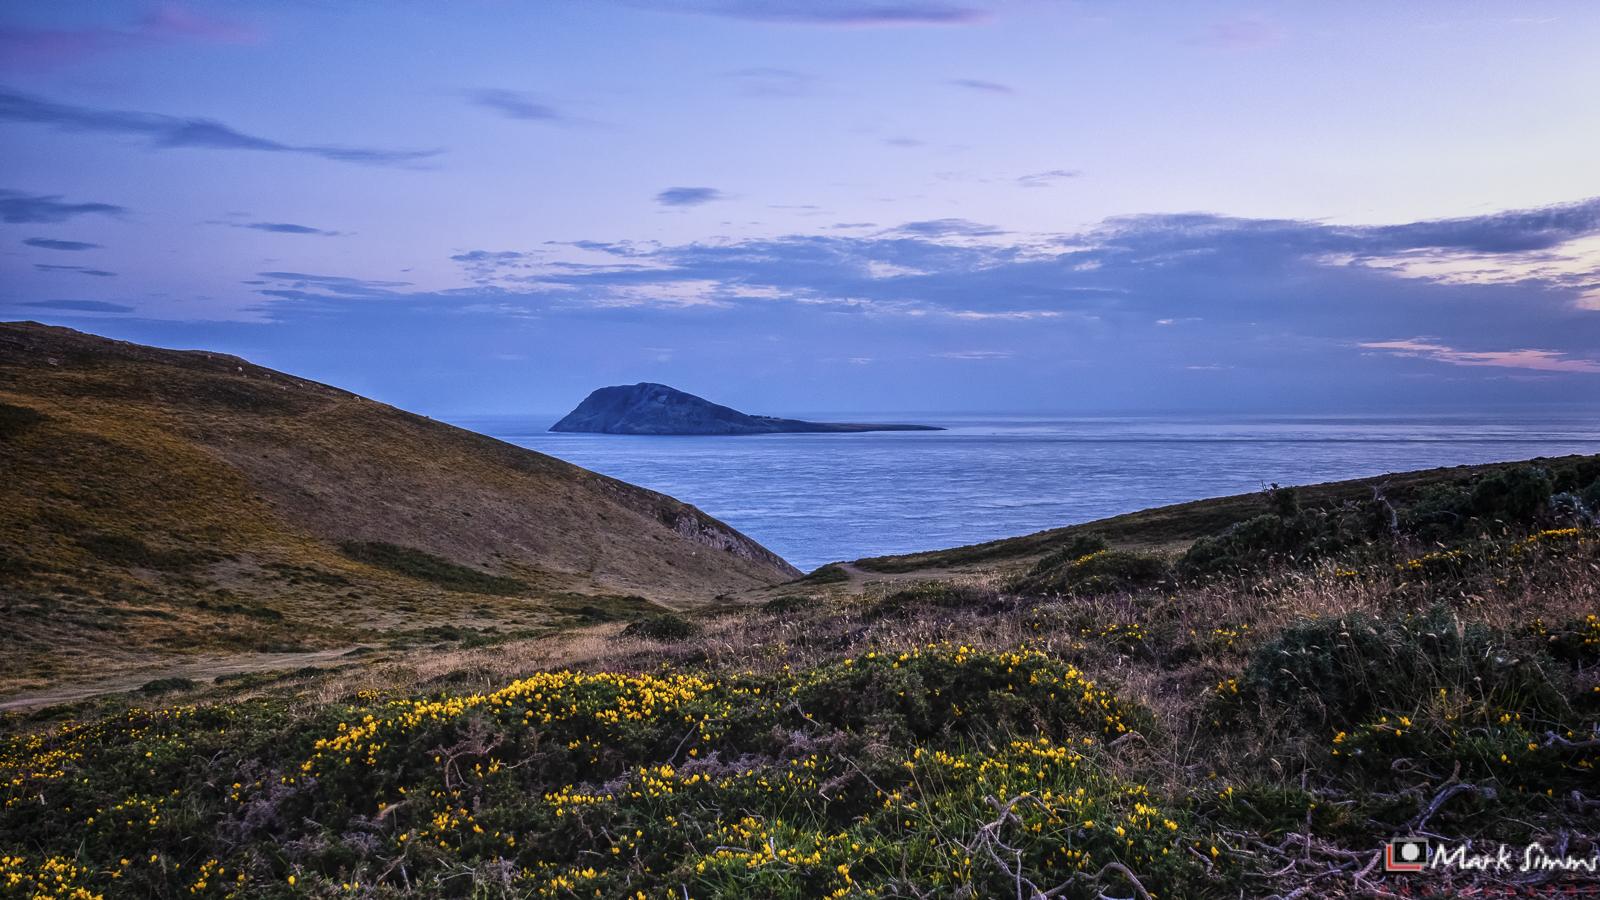 Bardsey Island, Llyn Peninsula, Wales, UK